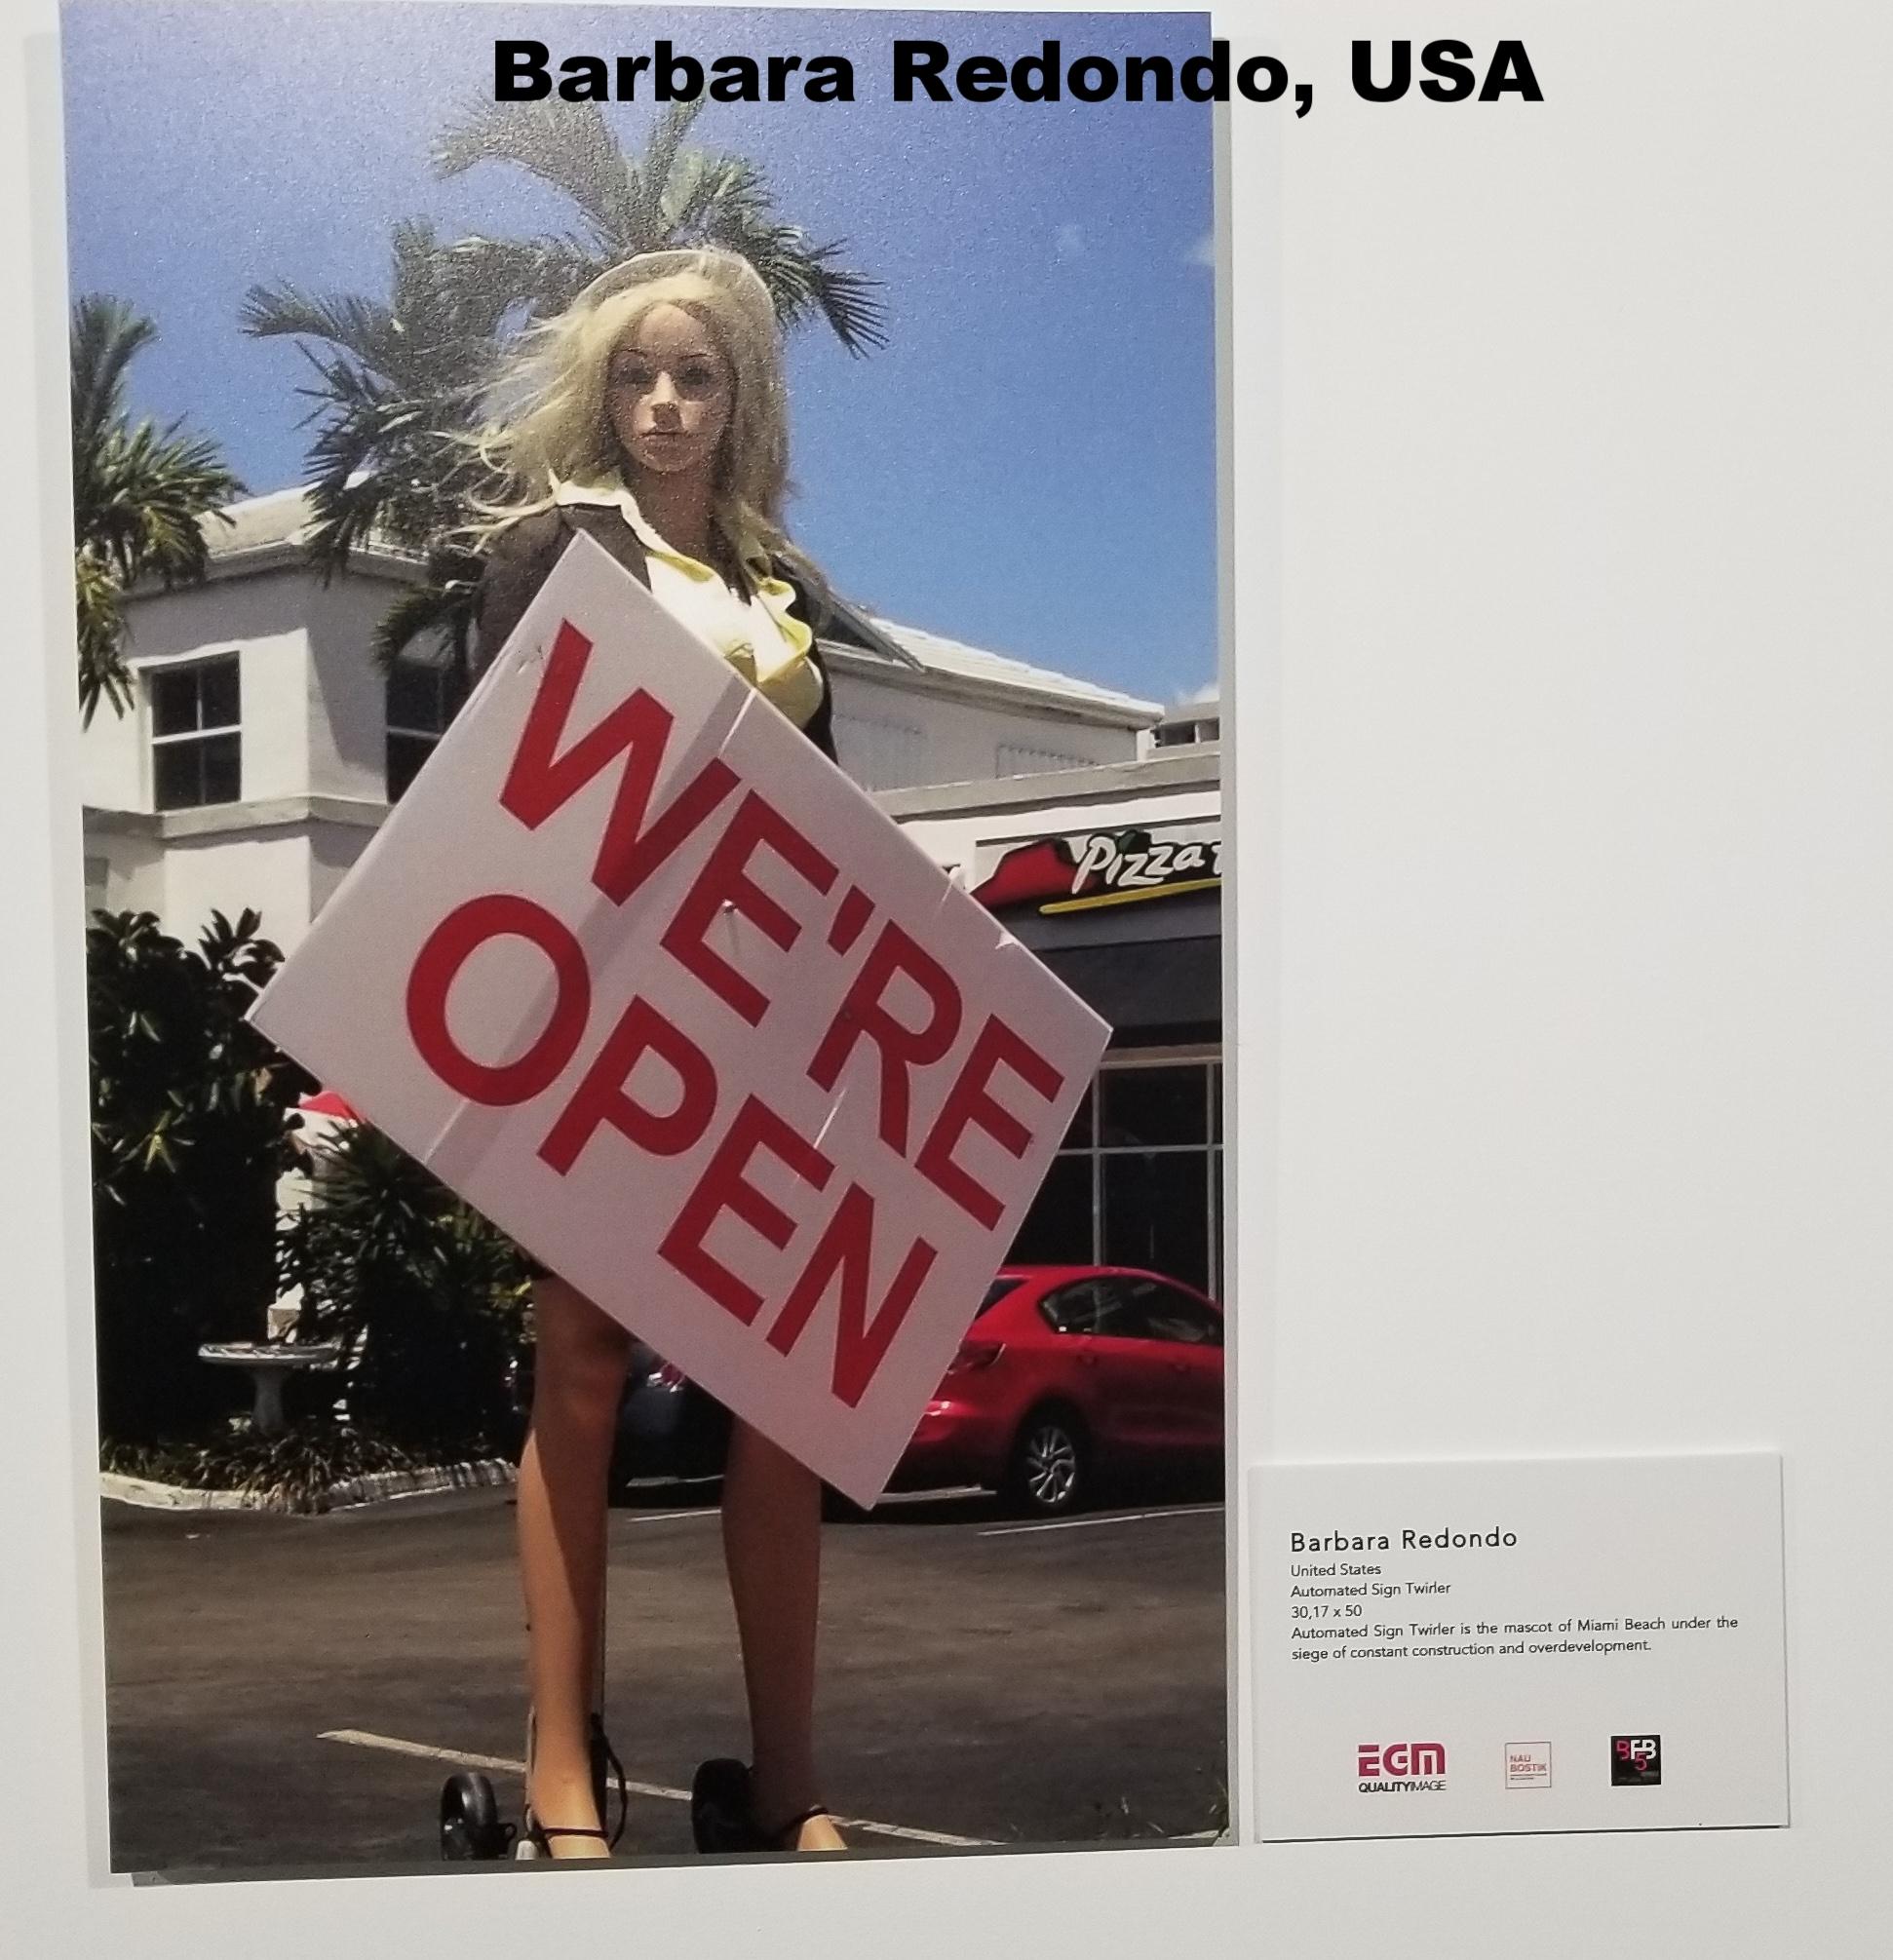 Barbara Redondo, United States